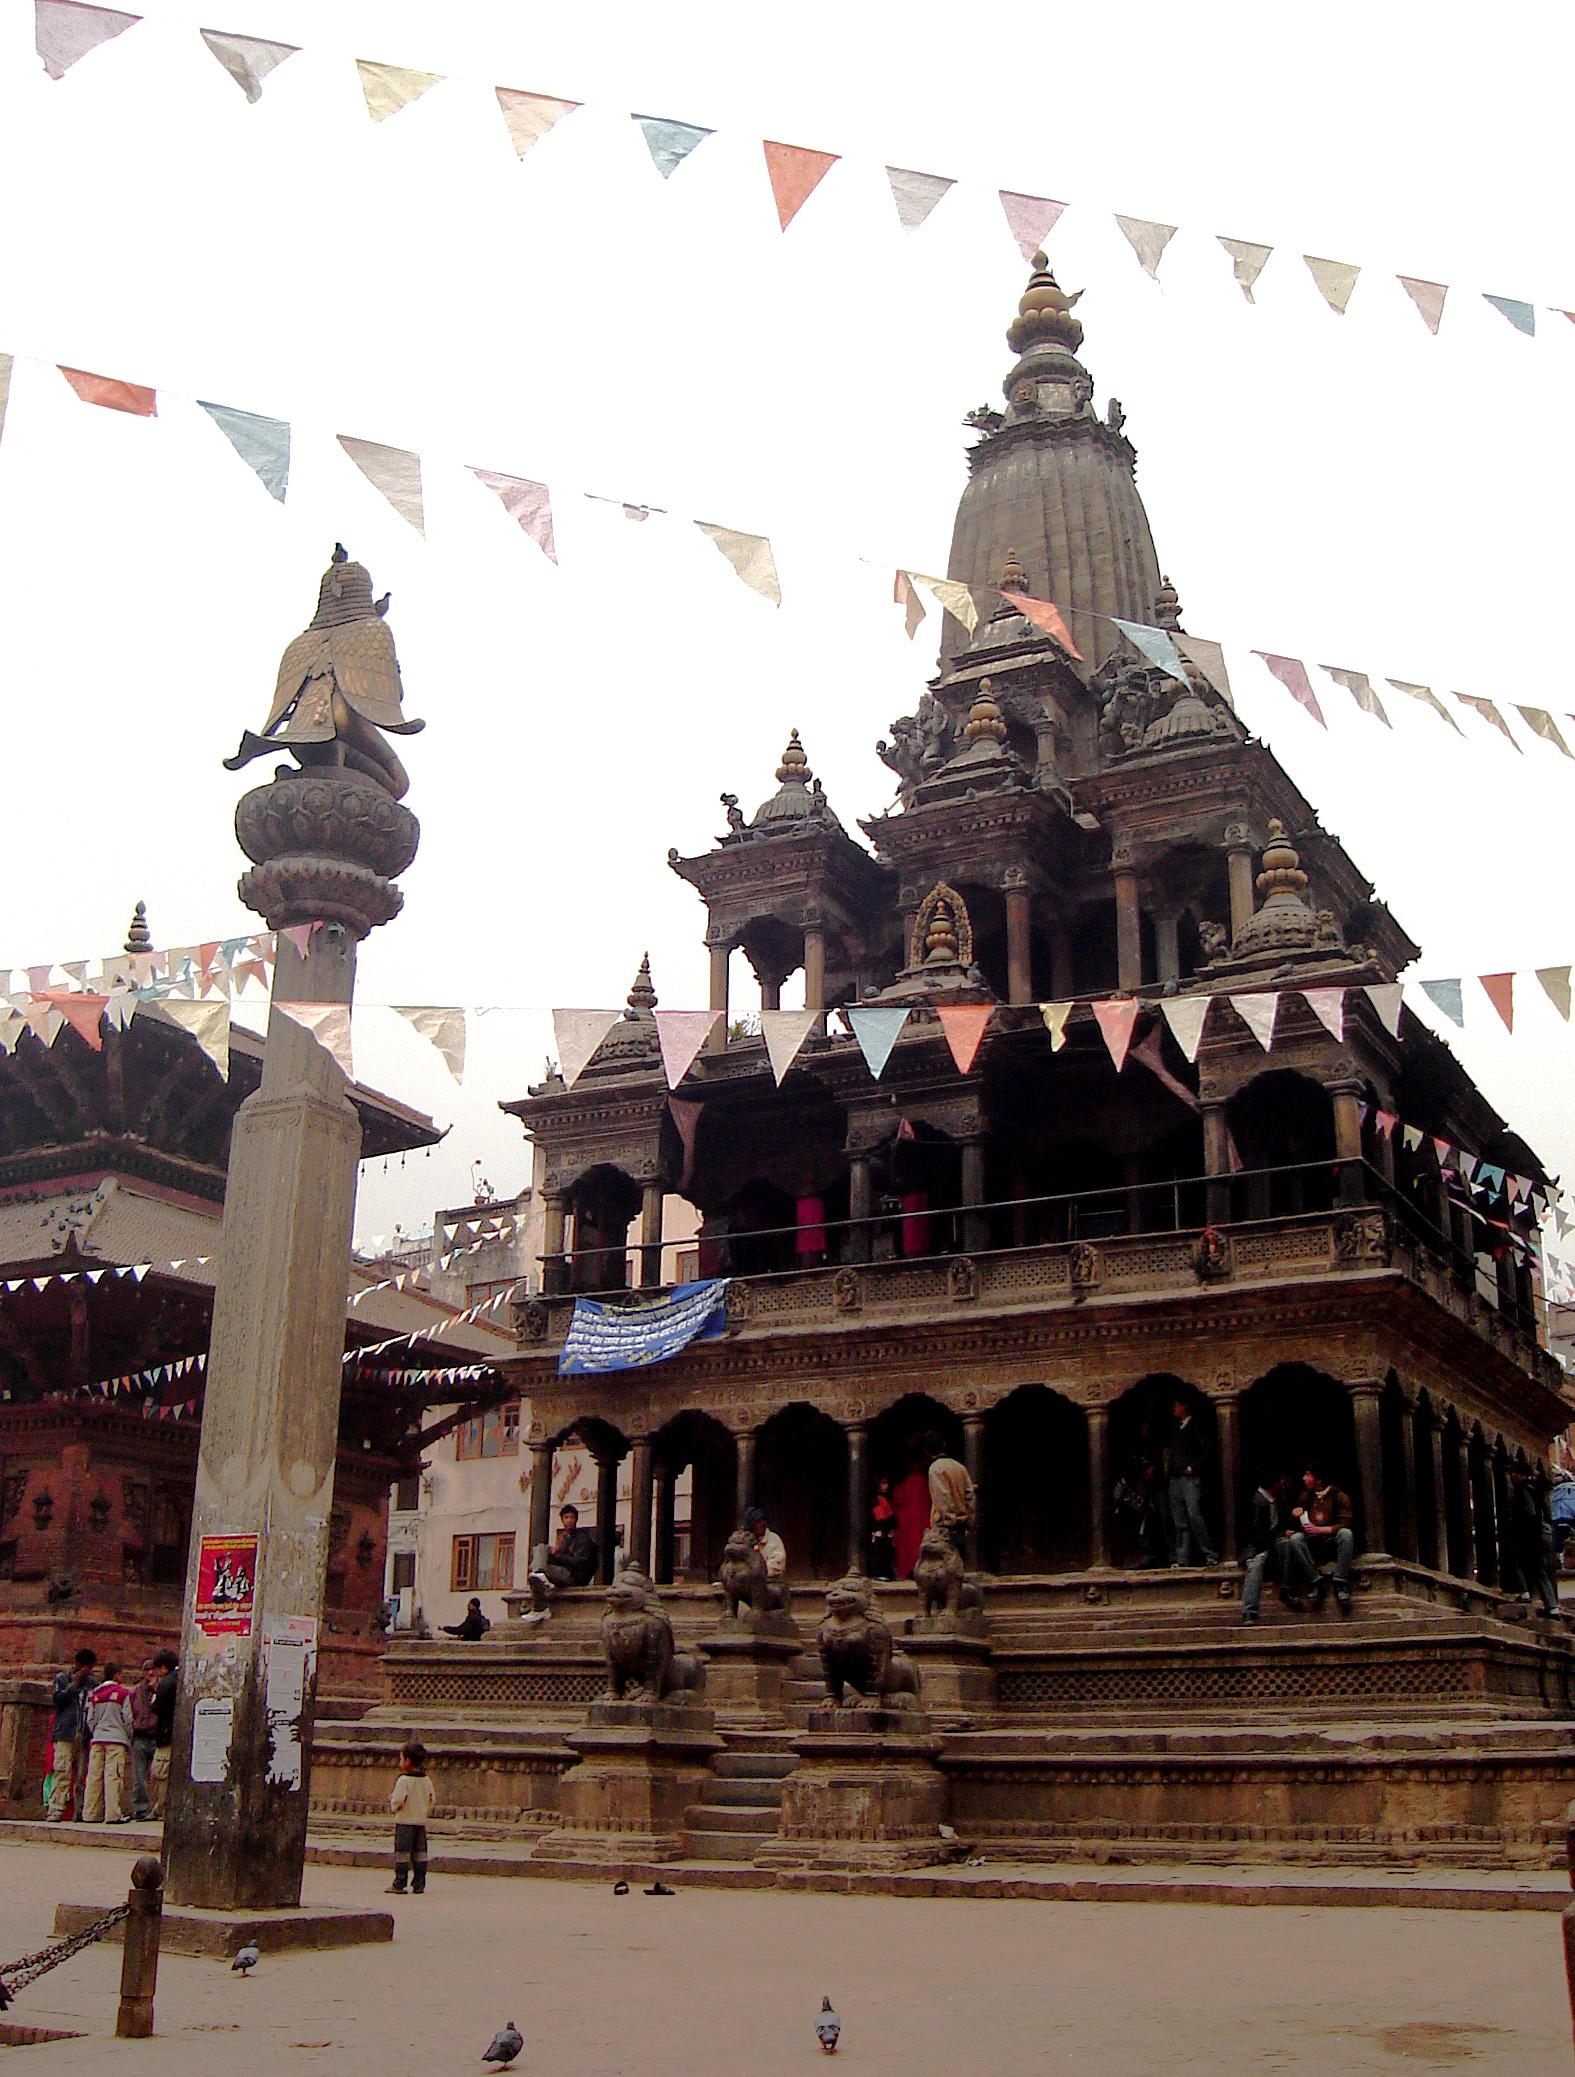 AMAZING TEMPLE PATAN NEPAL DURBAR SQUARE